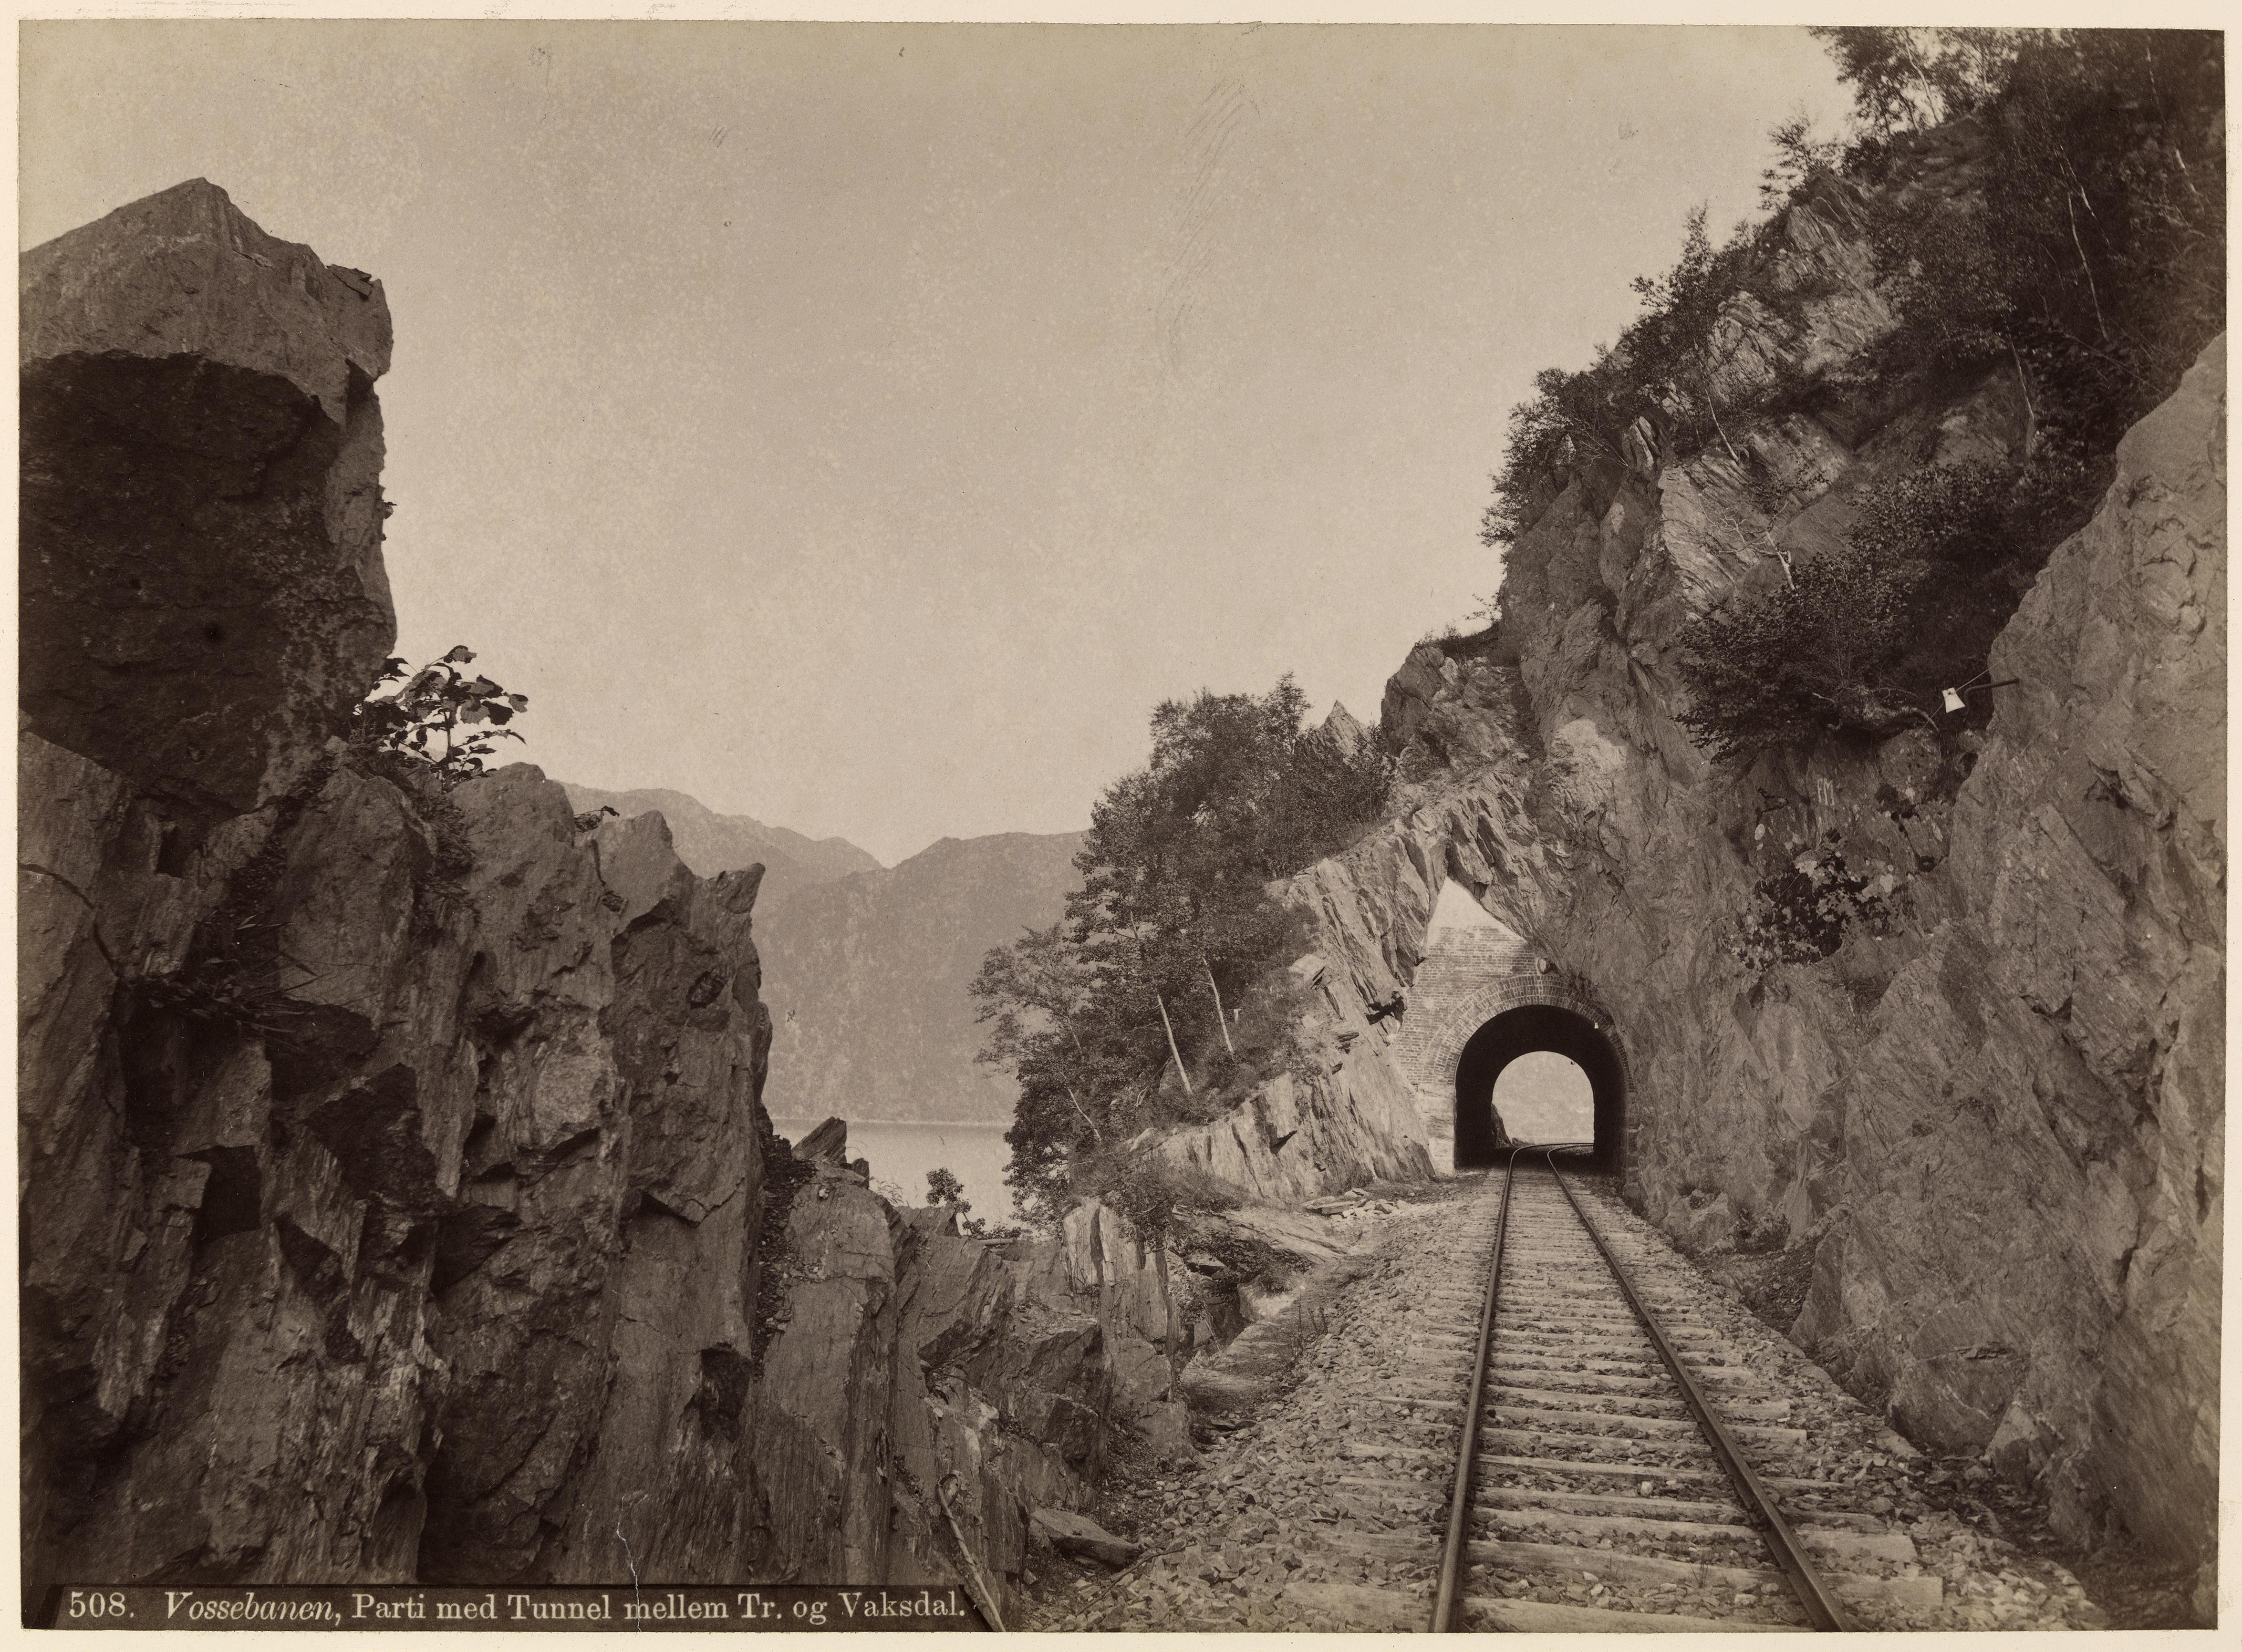 508. Vossebanen, Parti med Tunnel mellem Tr. og Vaksdal